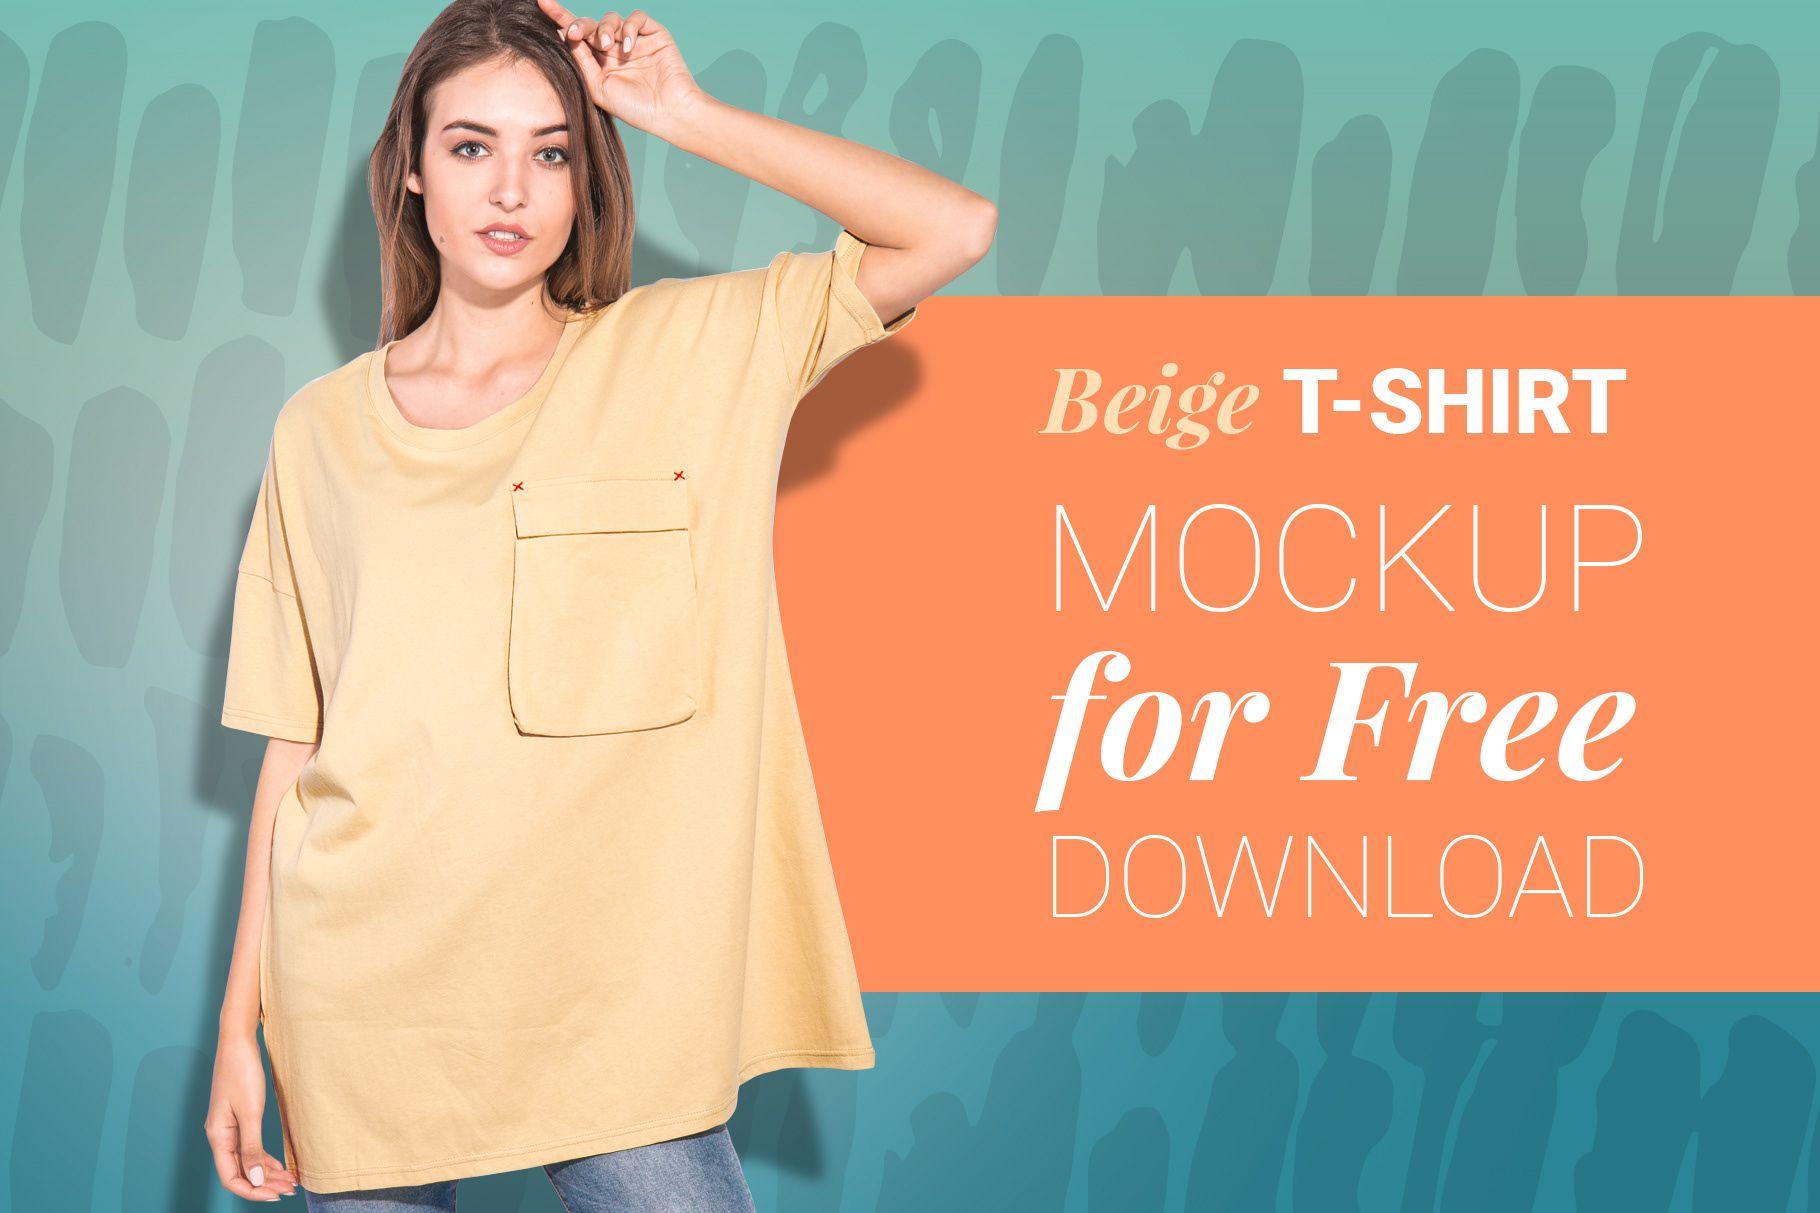 Download Woman Oversize T Shirt Mockup With Transparent Bg On Behance Behance Freebie Freedownload Mockupfree Shirt Mockup Tshirt Mockup Beige T Shirts